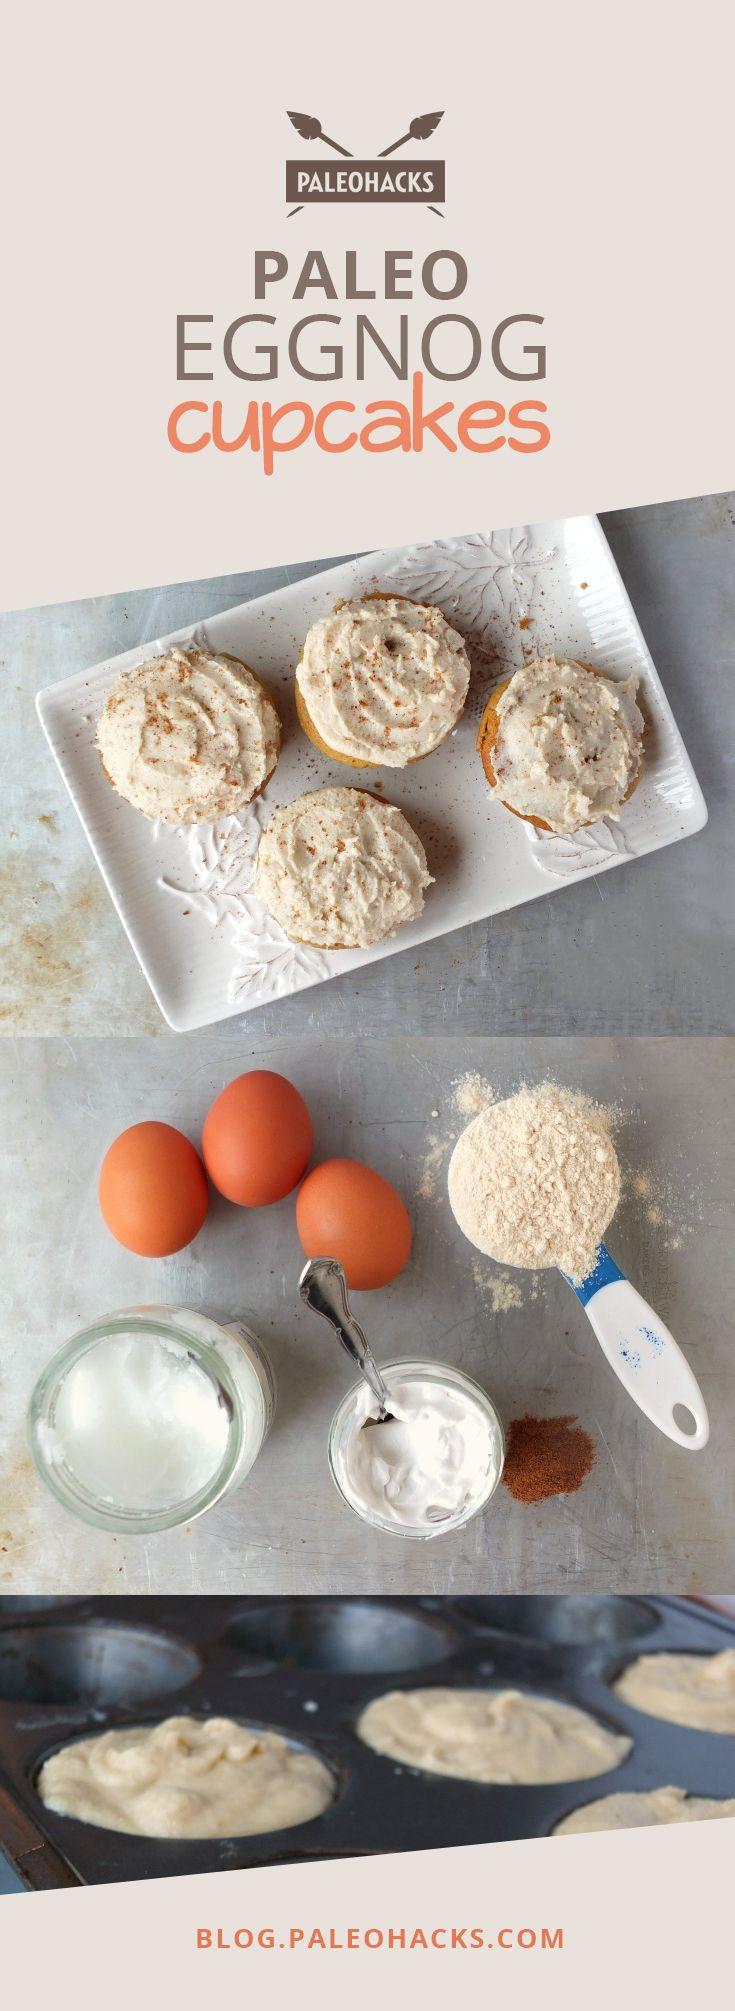 Paleo Eggnog Cupcakes  #justeatrealfood #paleohacks